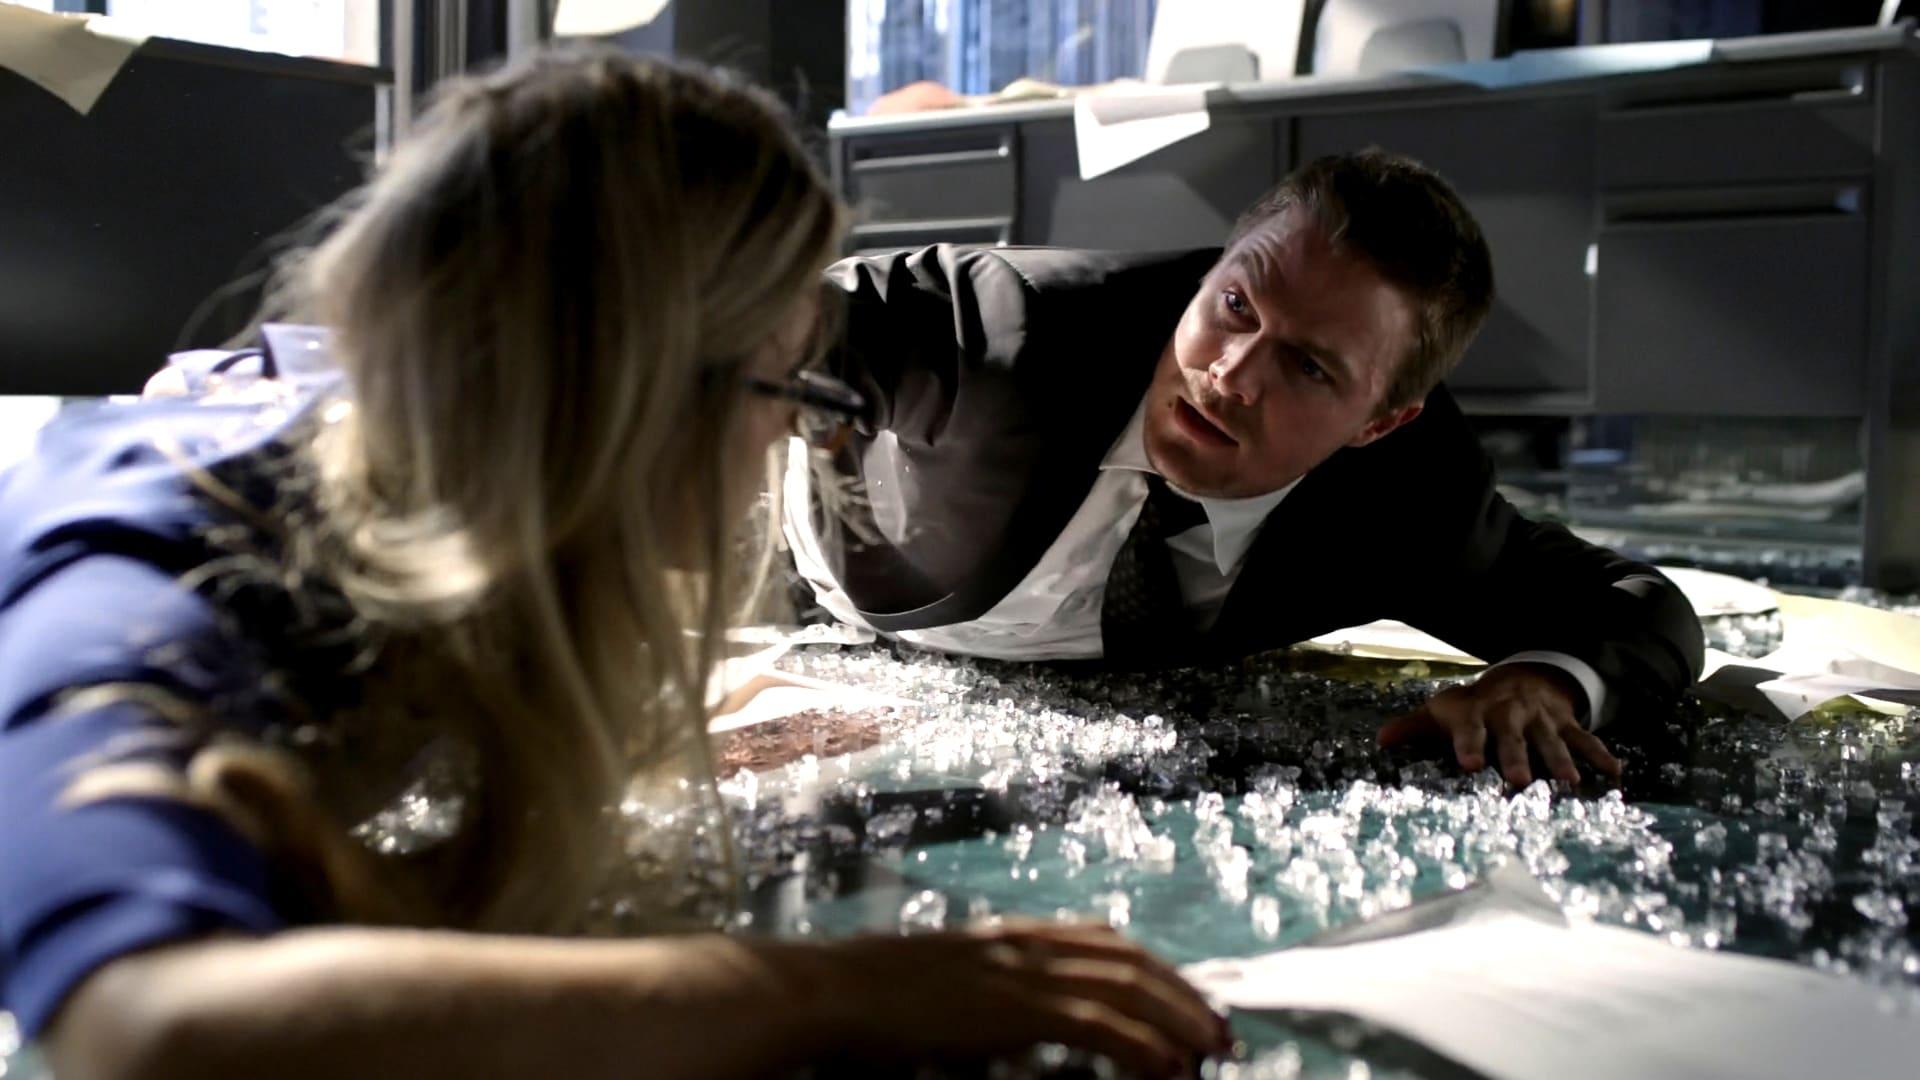 Arrow - Season 2 Episode 1 : Feindliche Übernahme